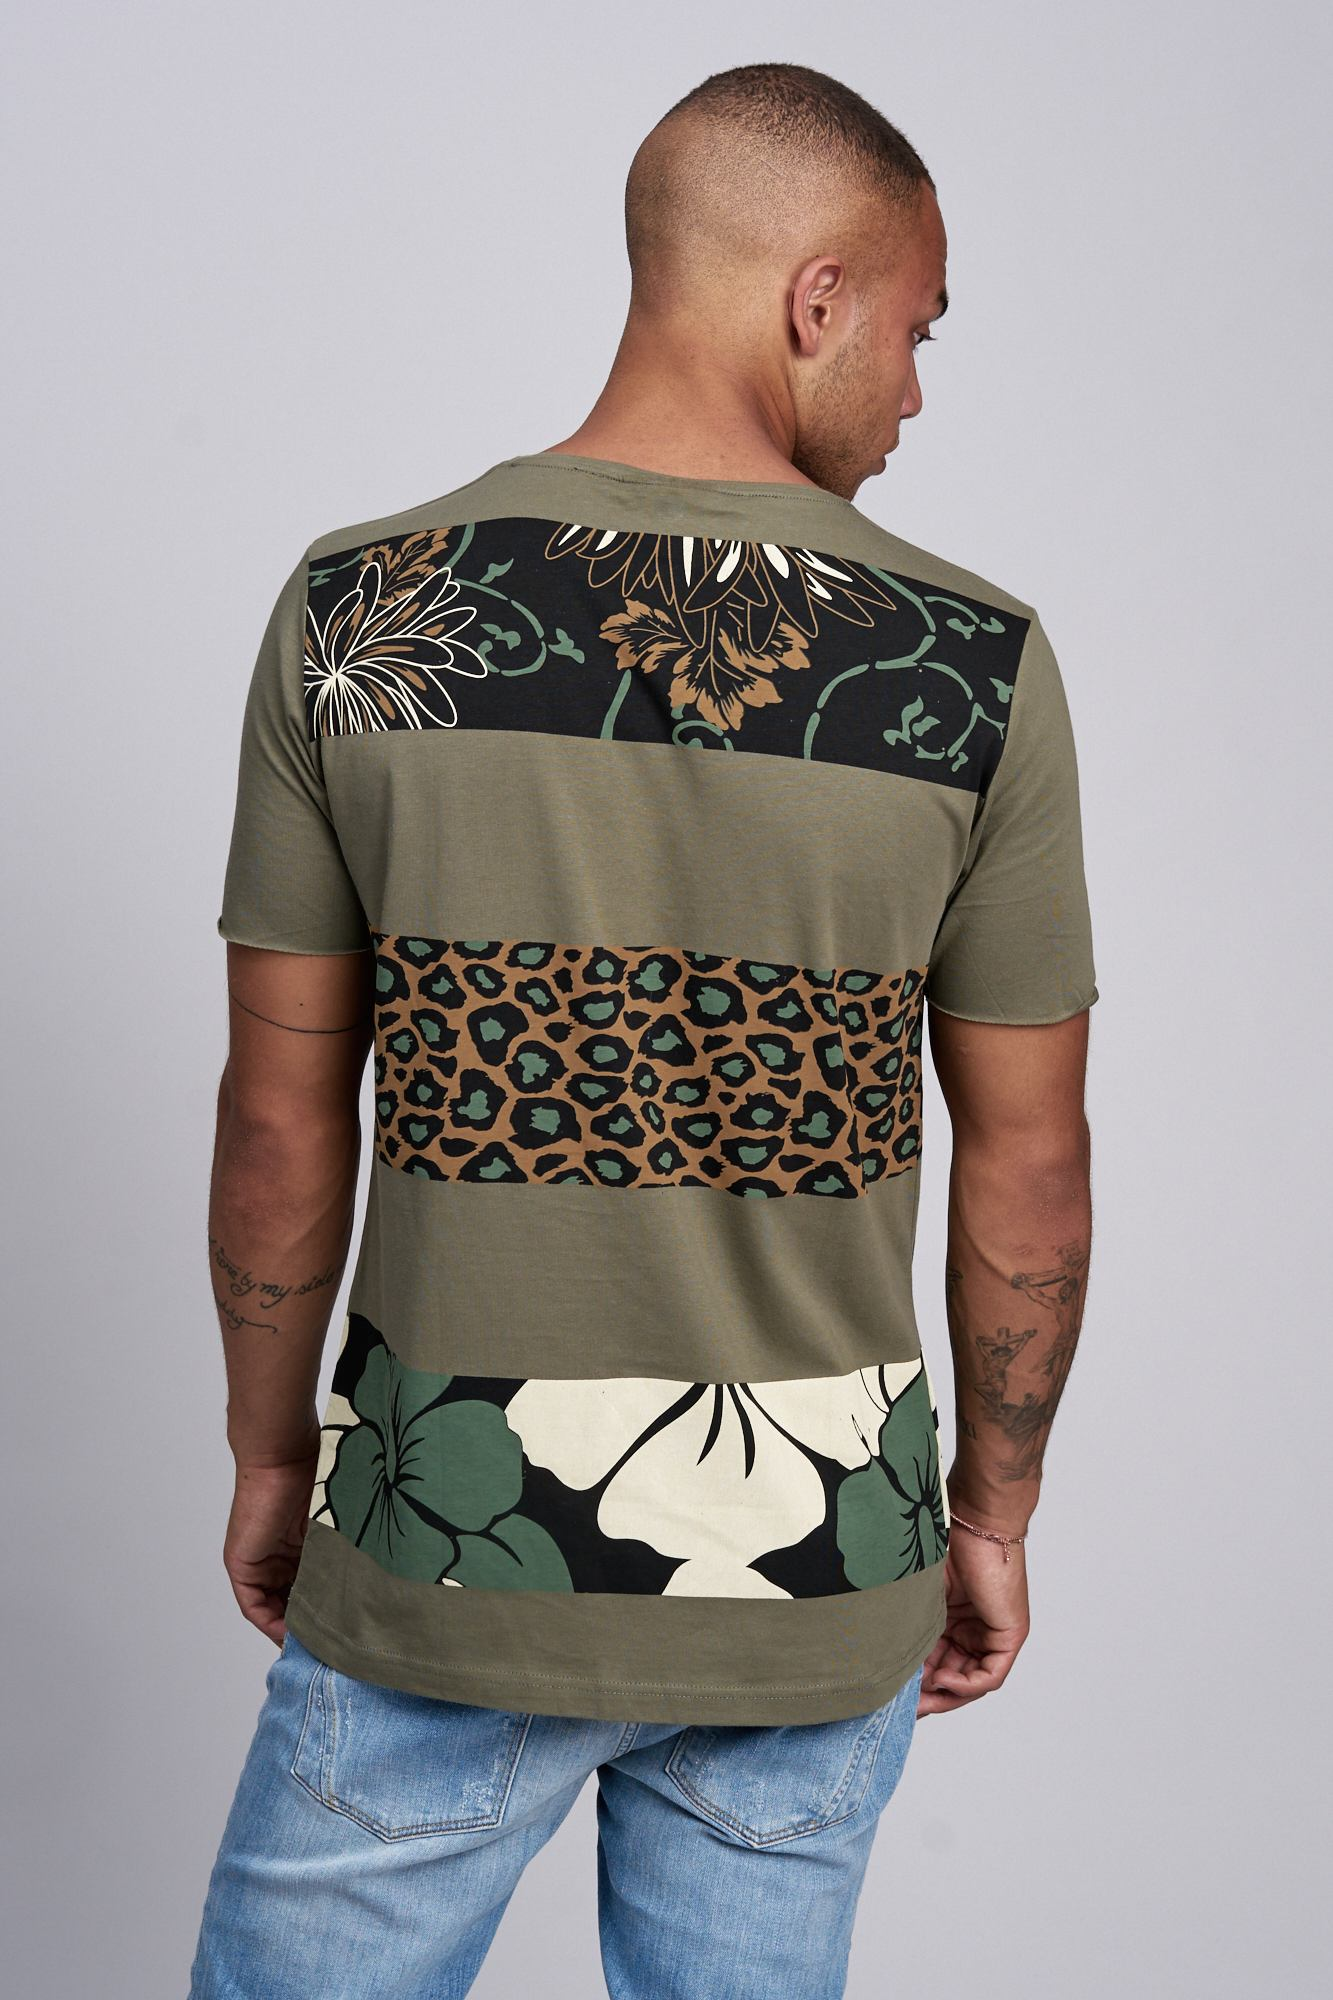 T-shirt-da-Uomo-Polo-Shirt-a-Maniche-Corte-printshirt-Polo-a-Maniche-Corte-17019-John-Kayna miniatura 11